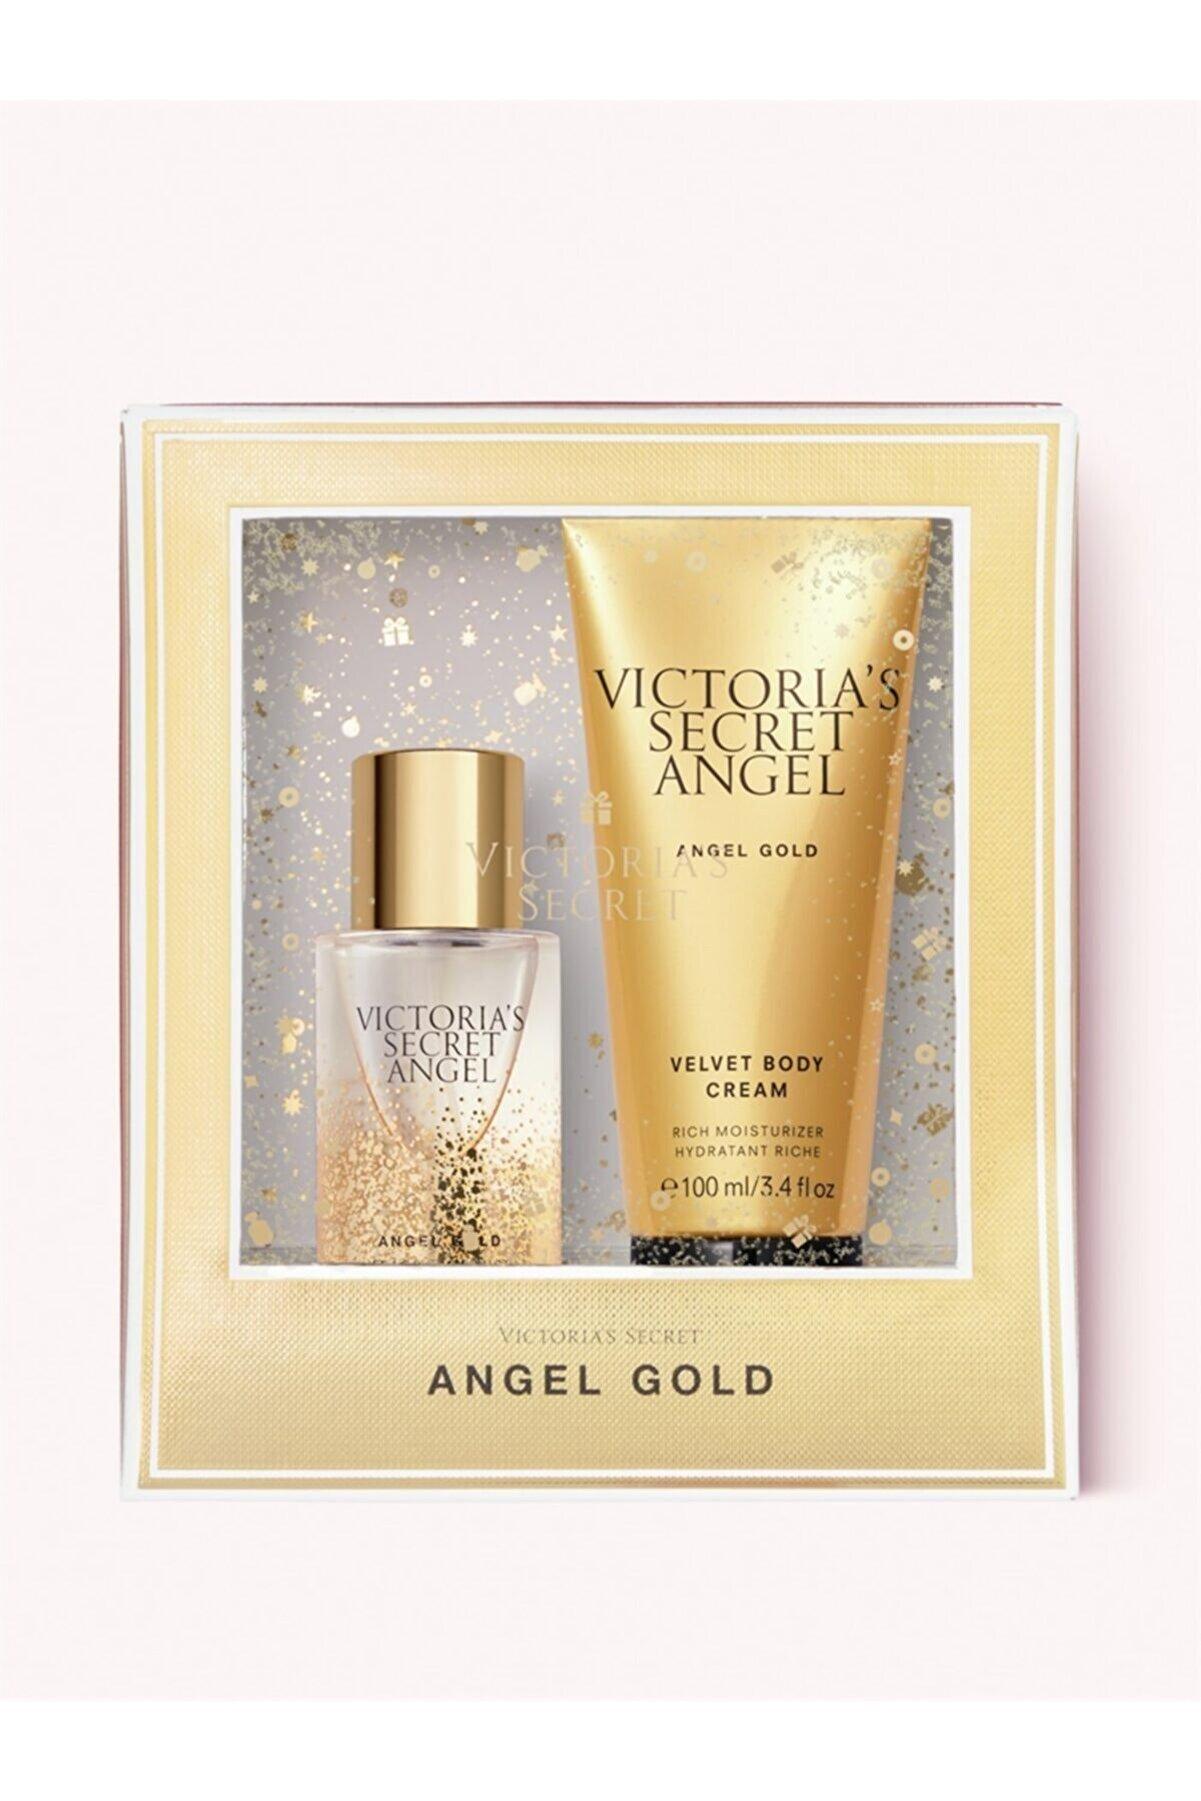 Victoria's Secret New Collection Angel Gold Sevgiler Gününe Özel Hediye Seti 2'li